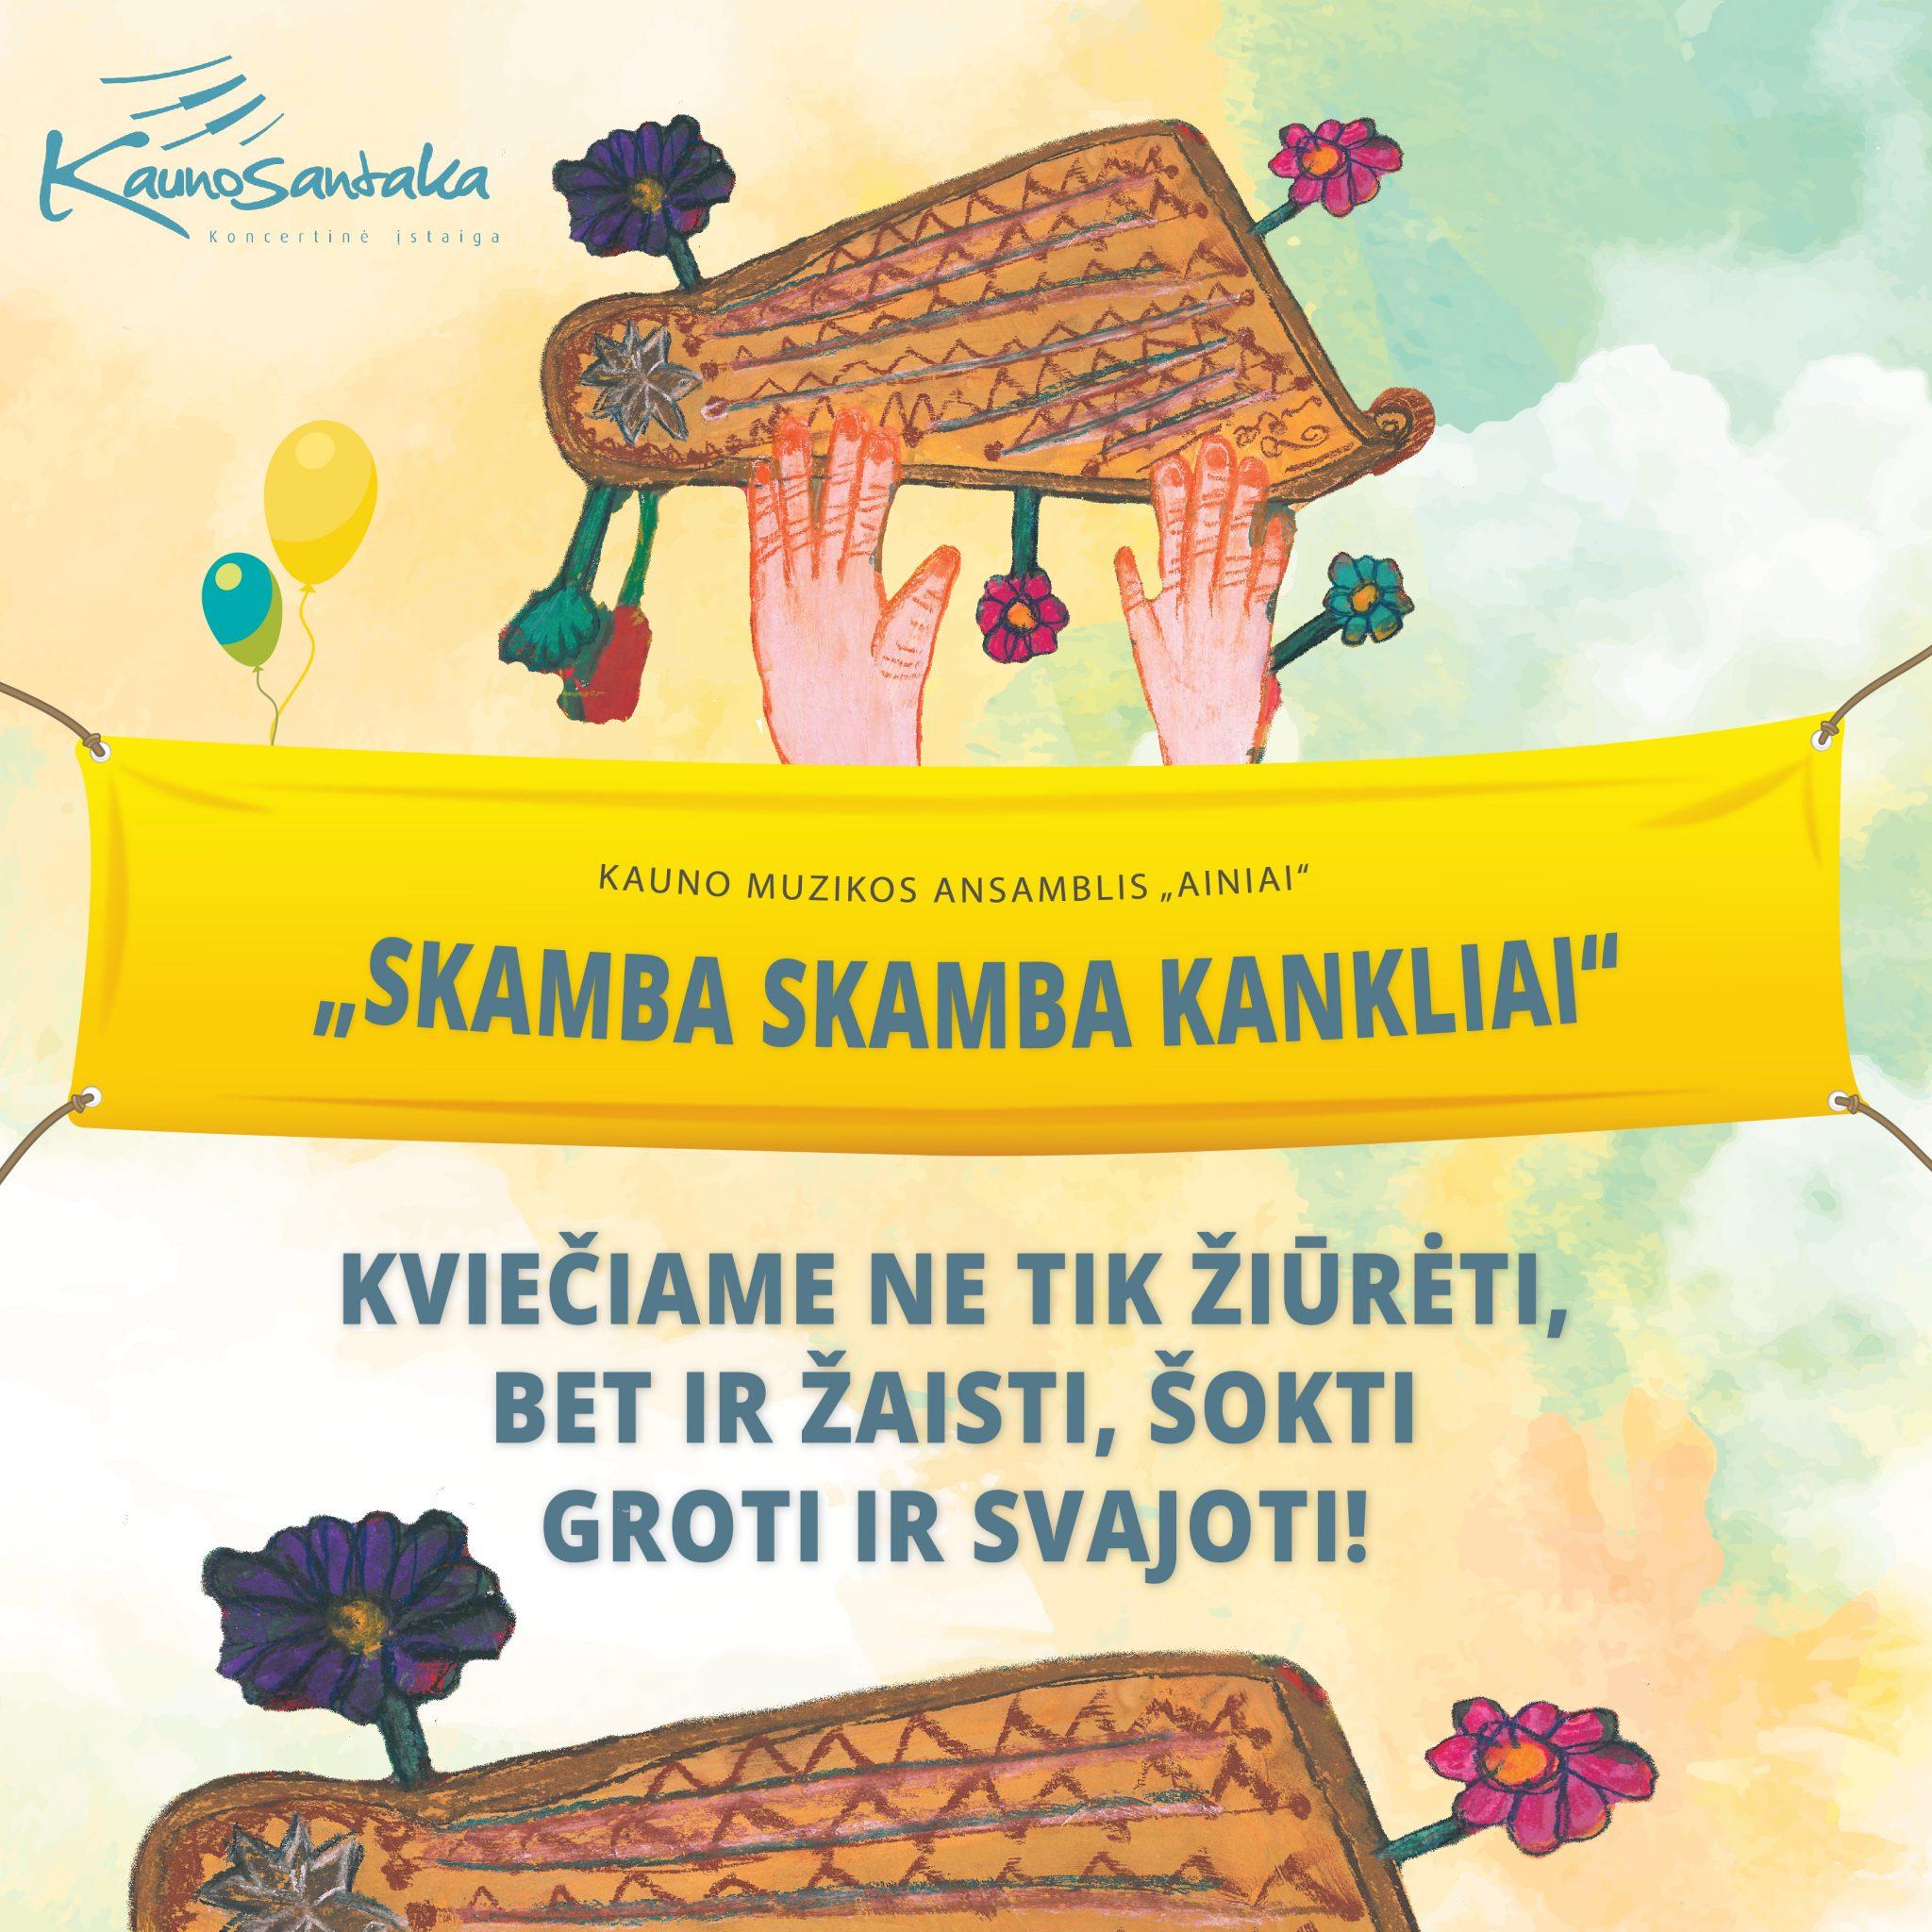 Skamba kankliai_297x297_KS-01-01